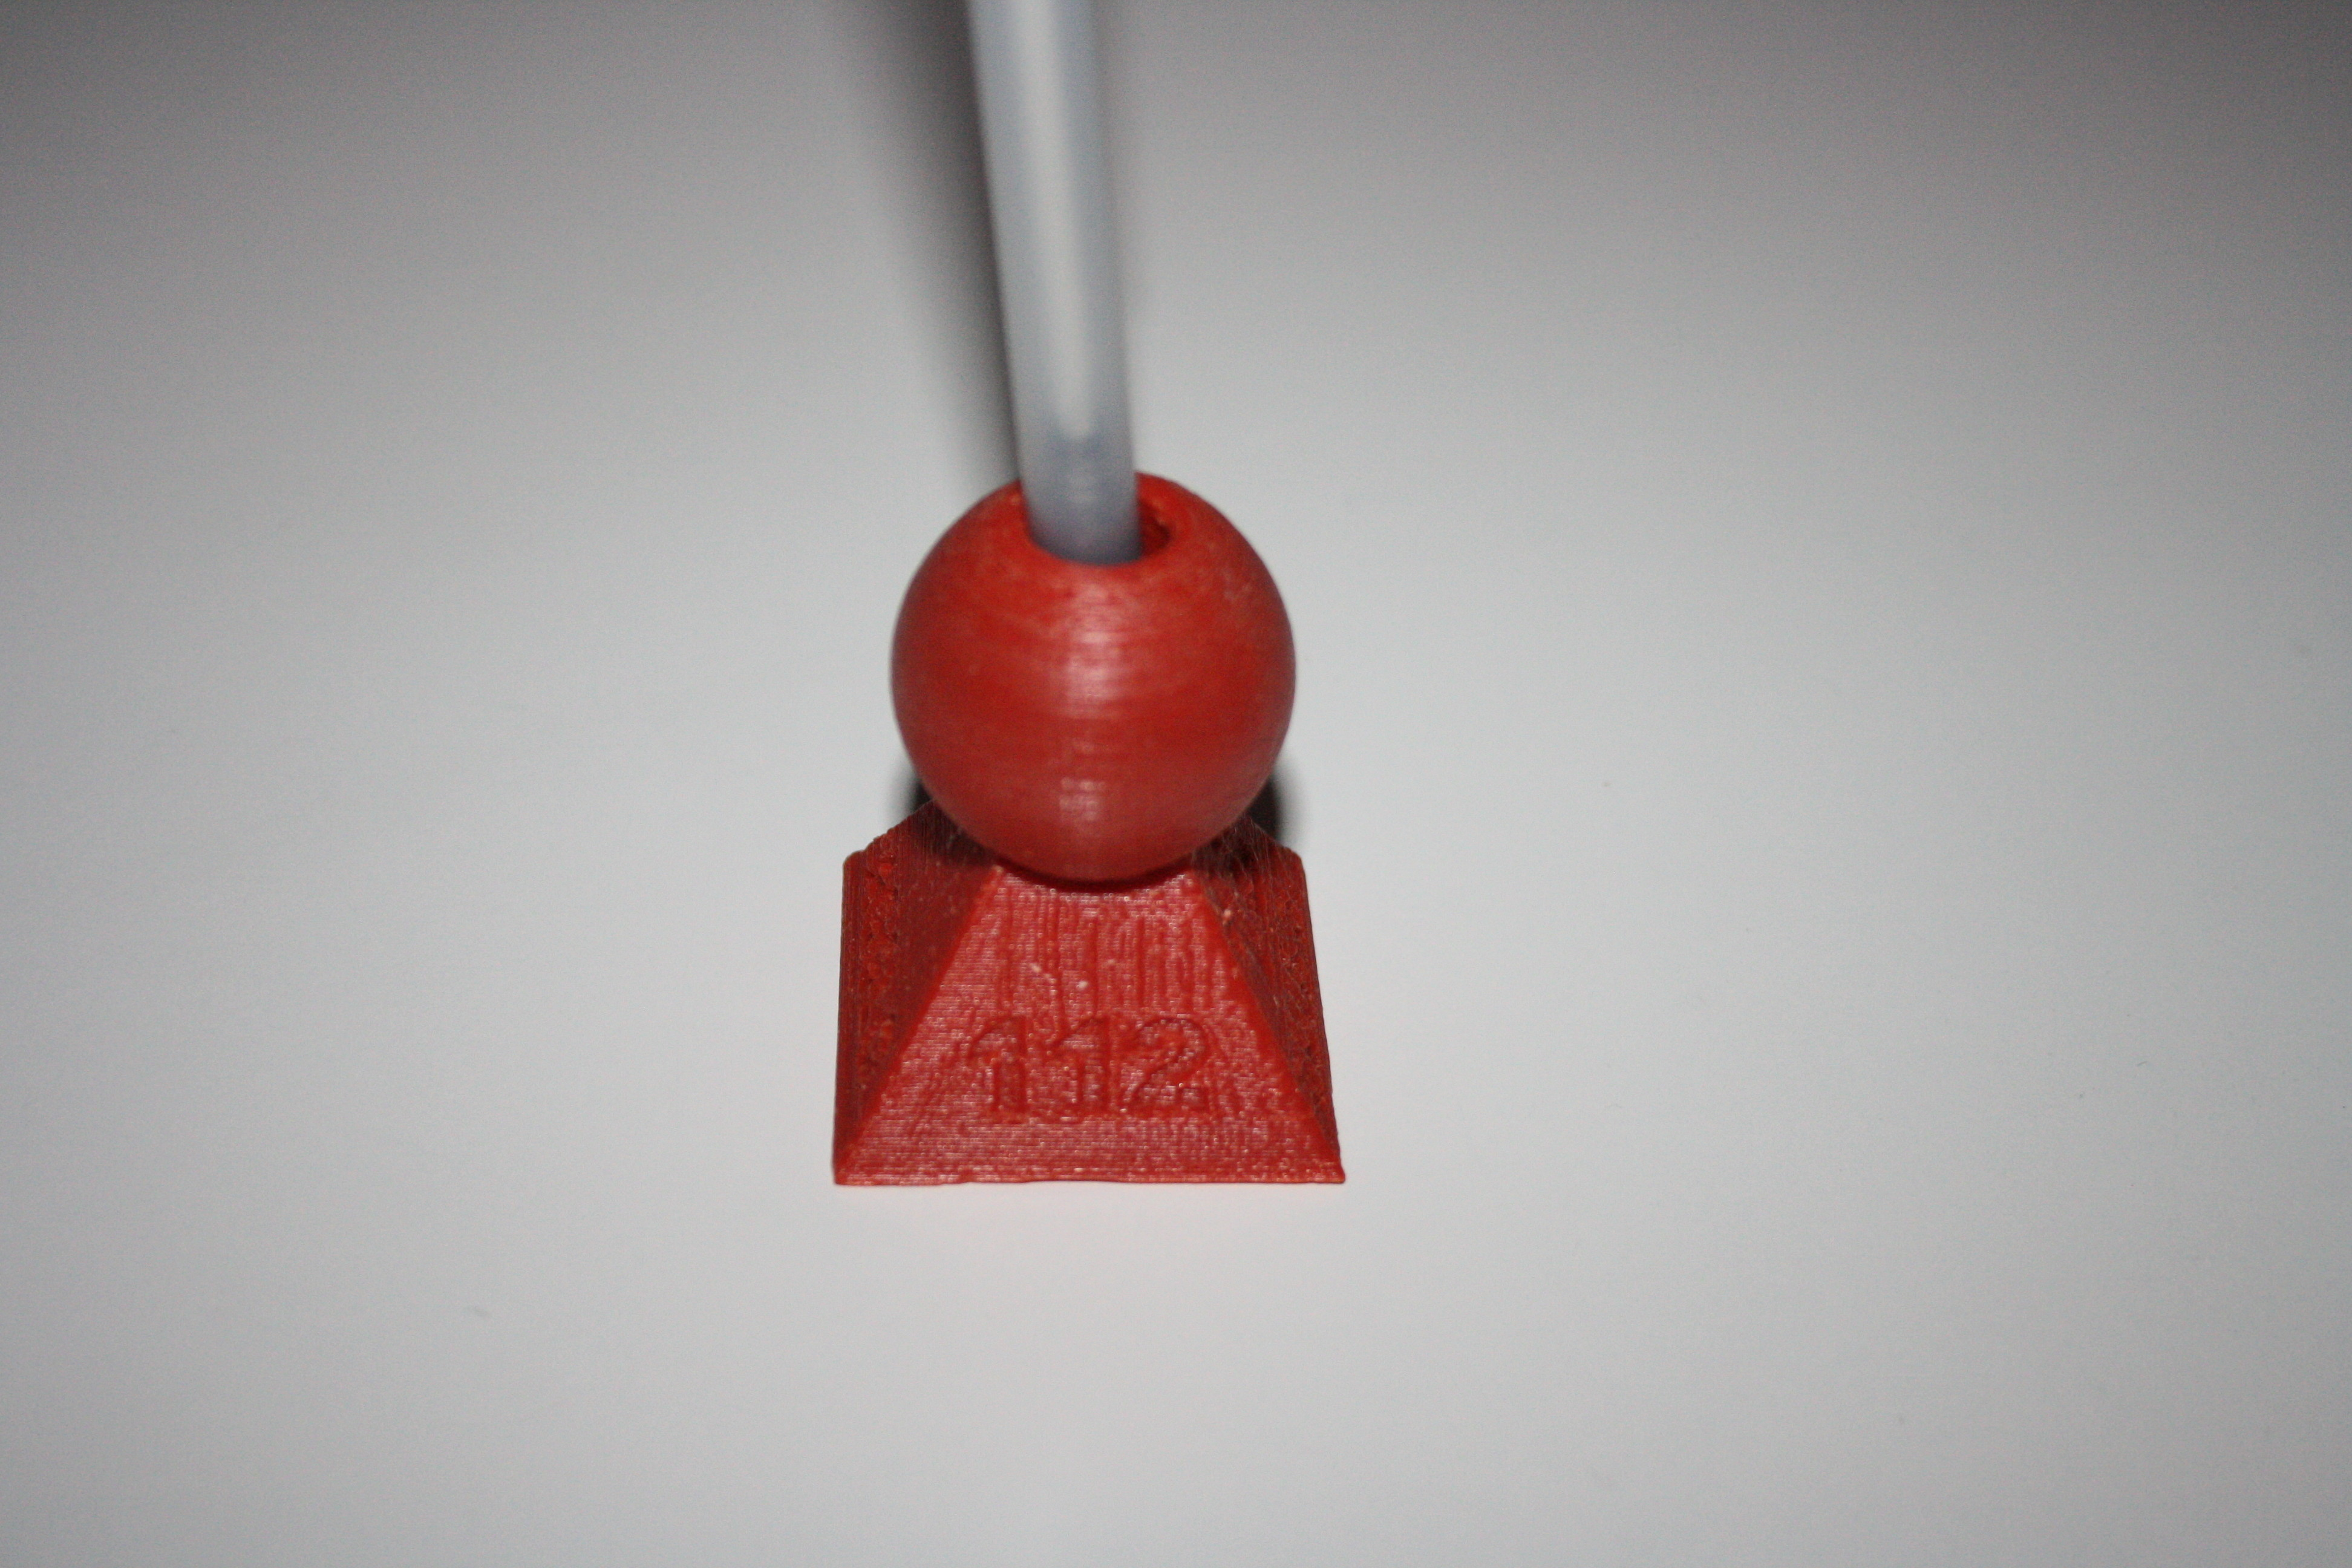 25_1_02014_032.JPG Download free STL file Support-crayon • 3D printing model, JJB